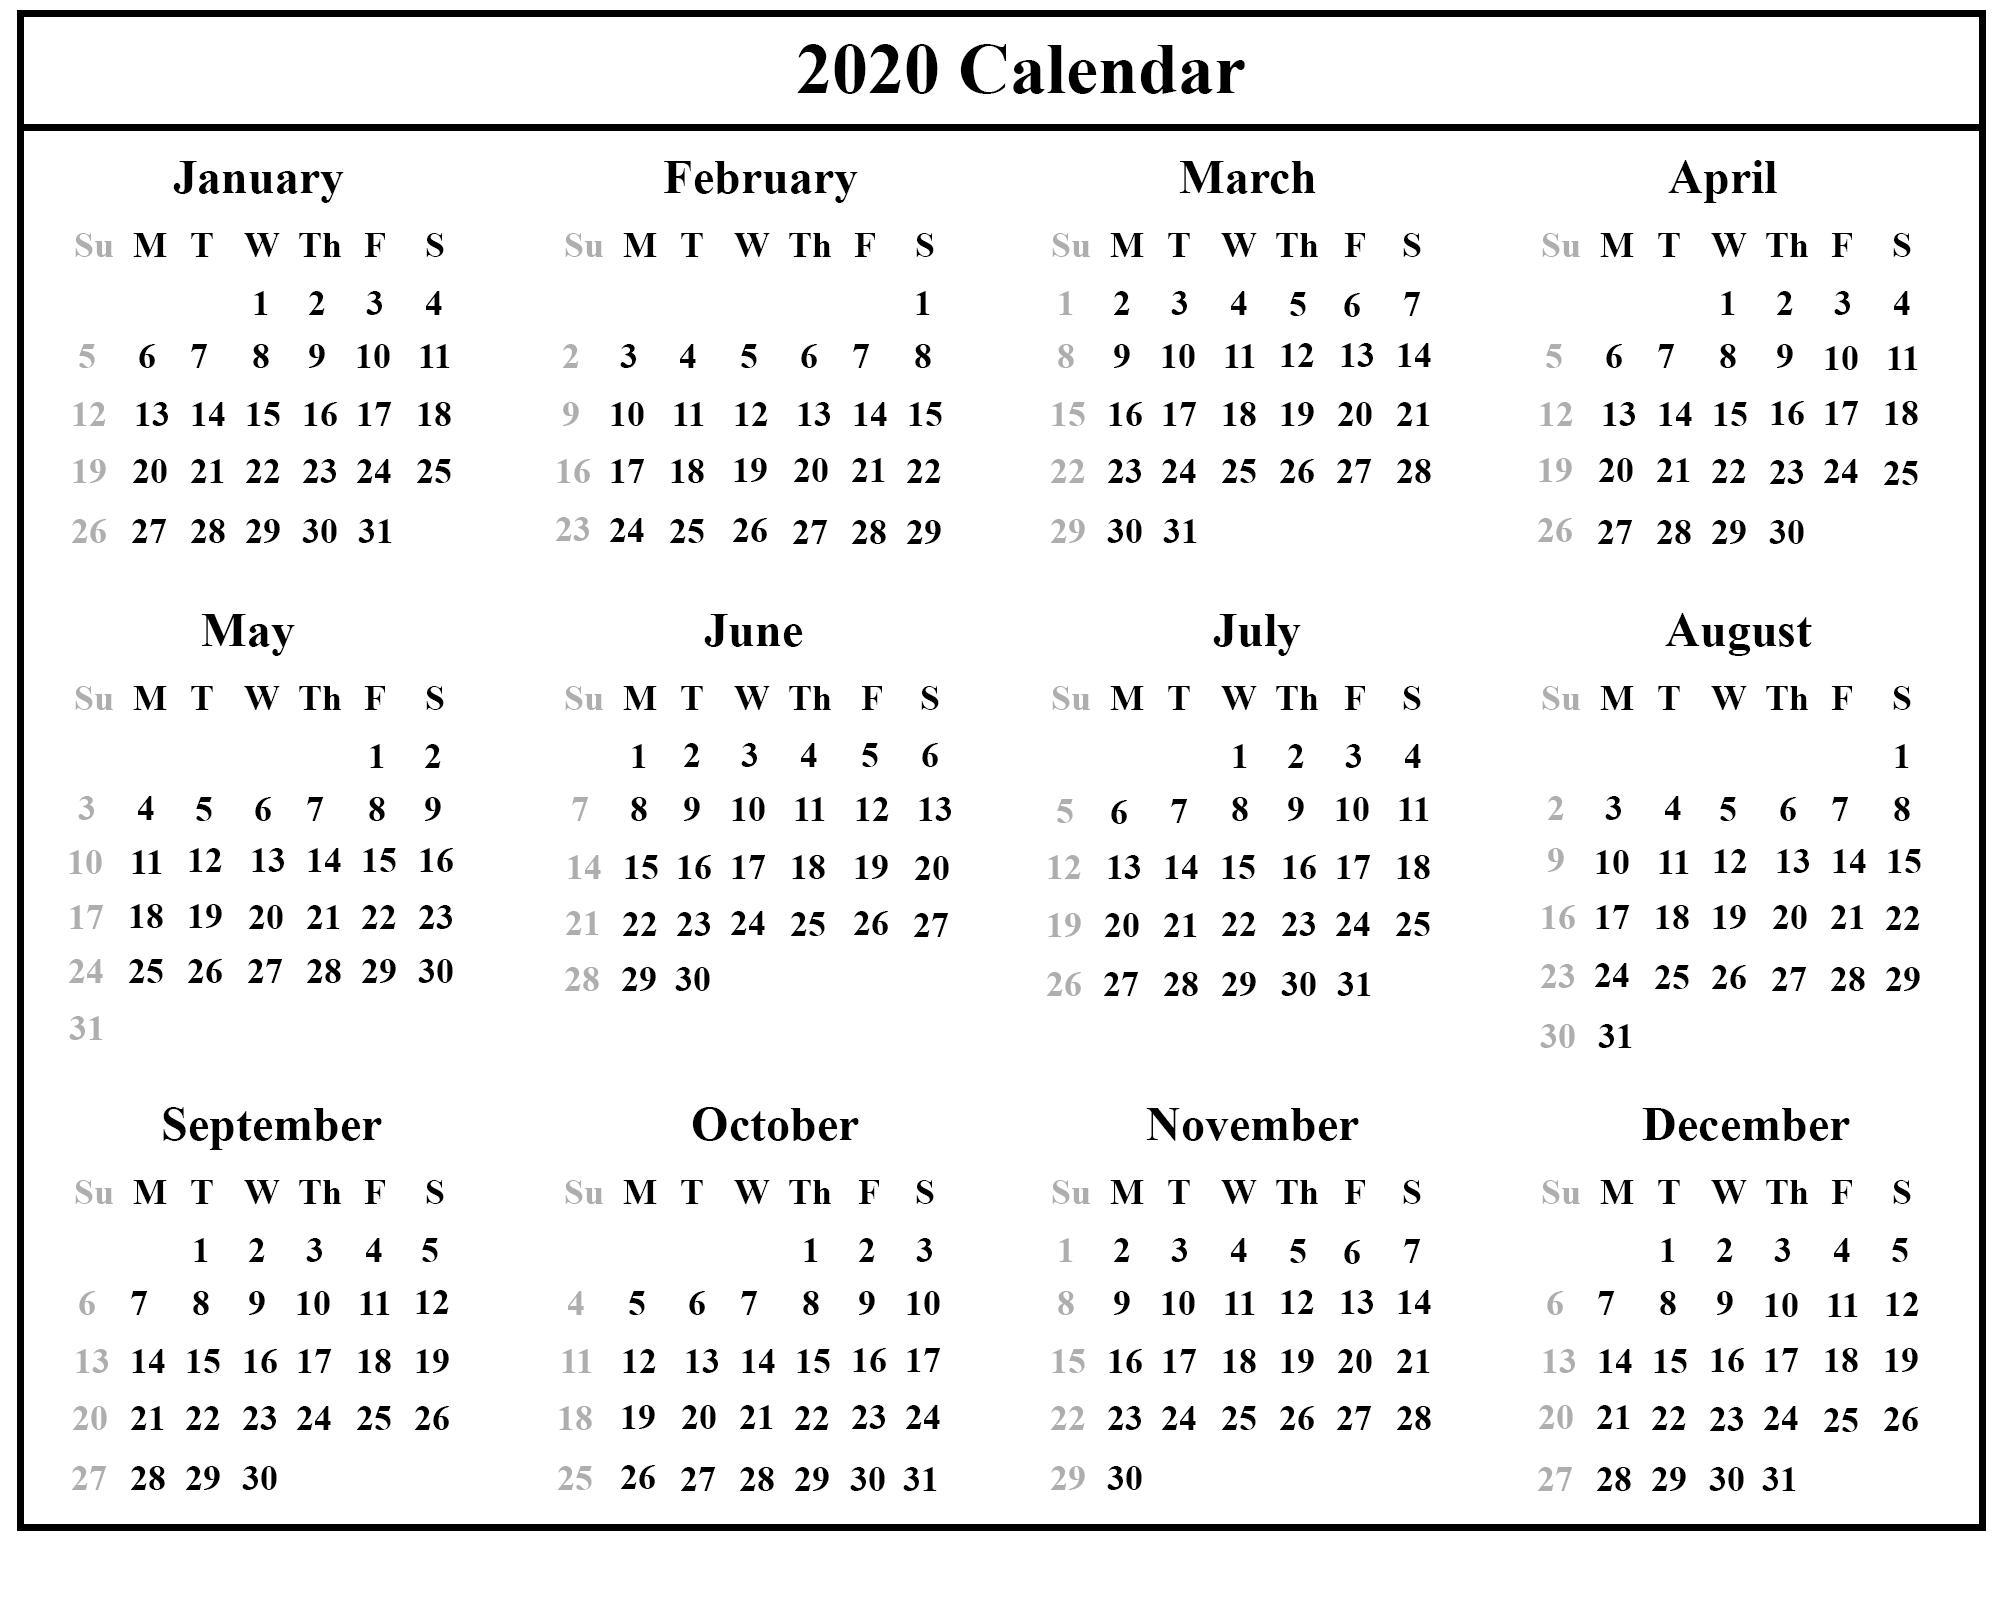 Editable 2020 Calendar Printable Template Blank With Notes-3 Month Editable Calendar 2020 Template